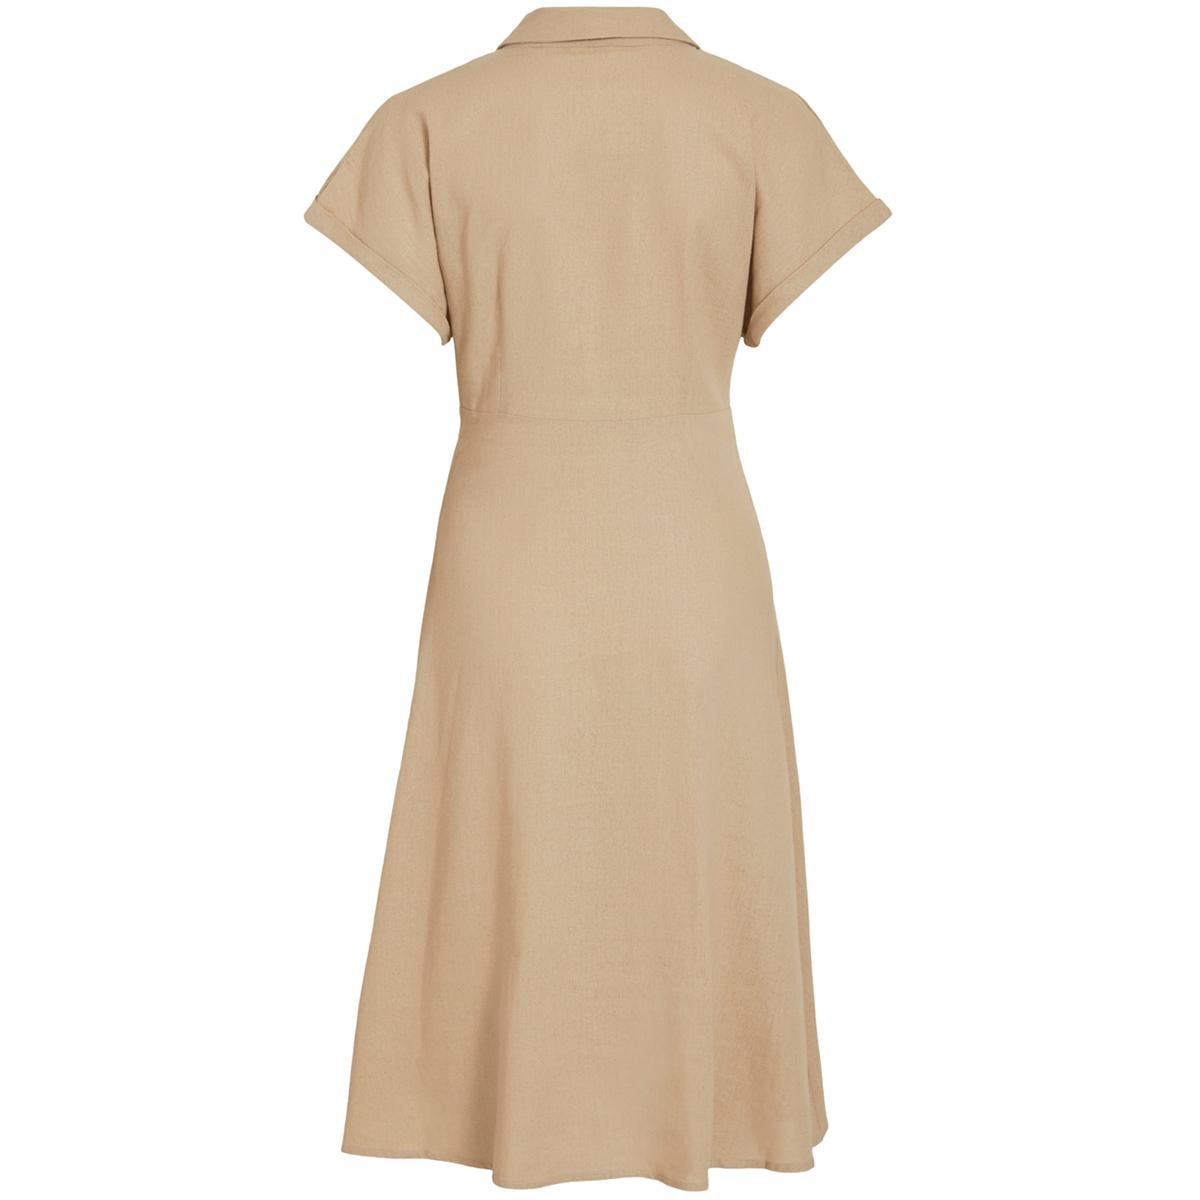 objnans s/s long dress 107 div 23032304 object jurk hummes